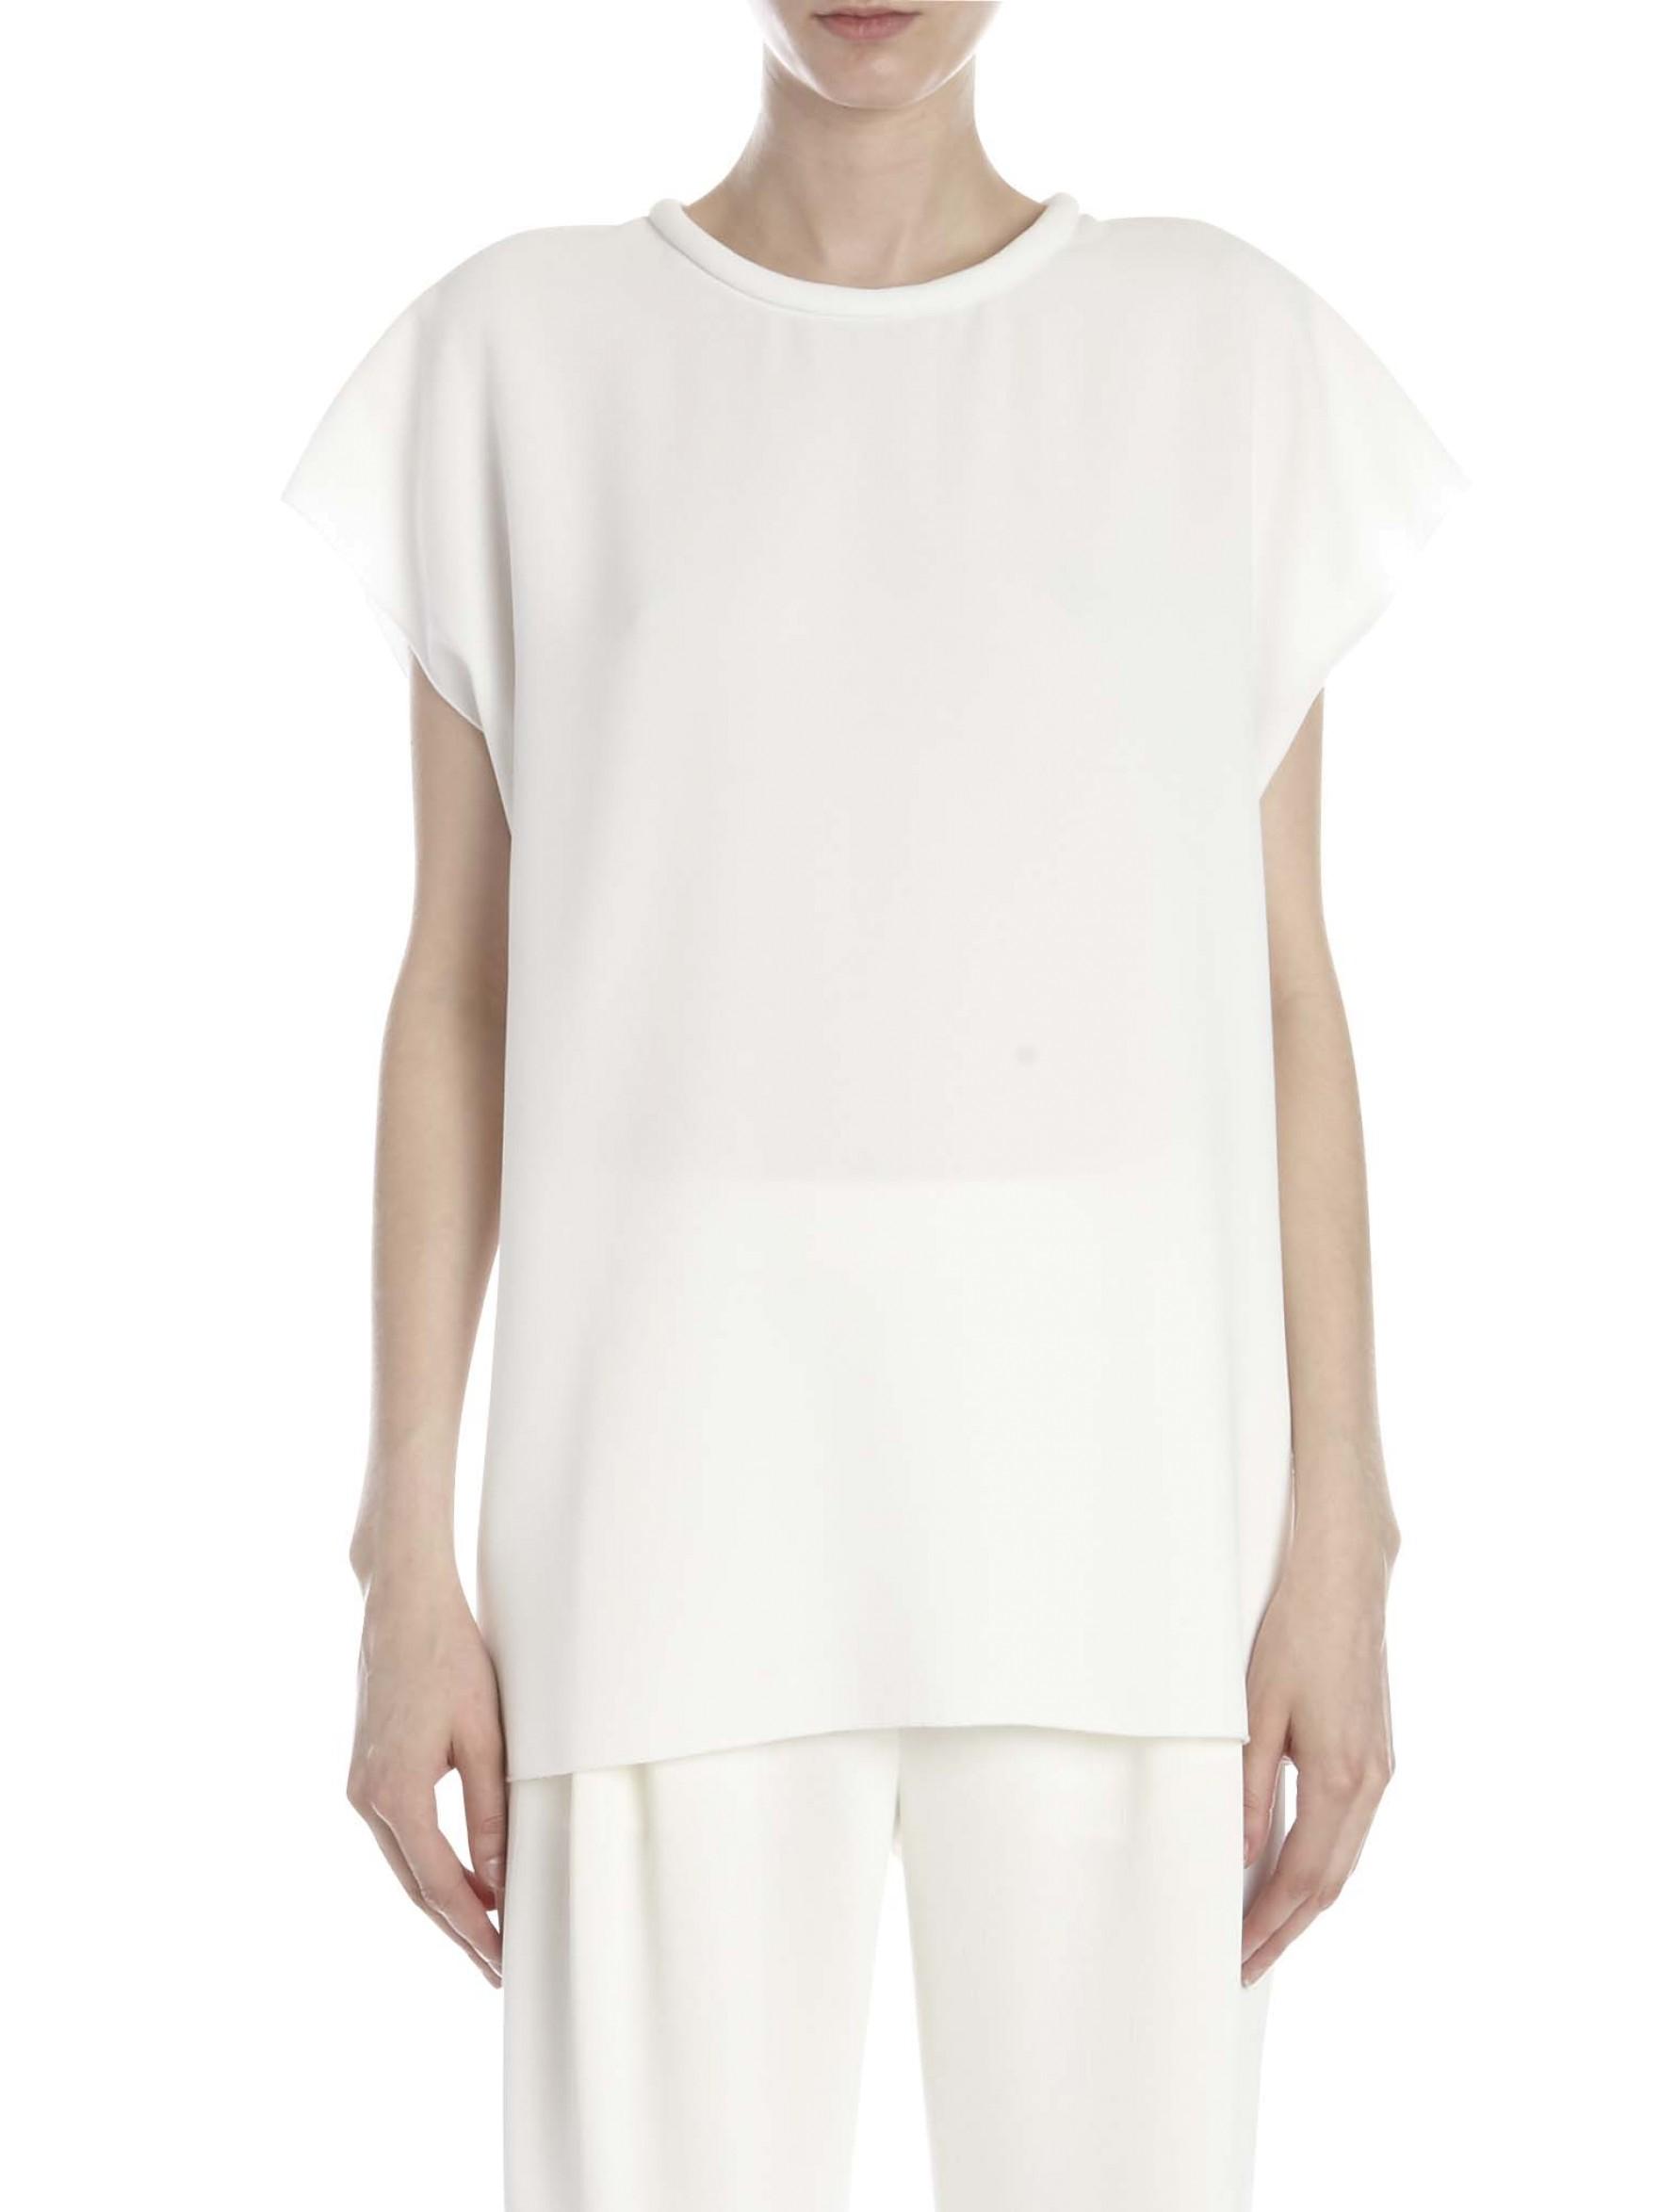 Nicholas Roll Neck T Shirt In White Lyst